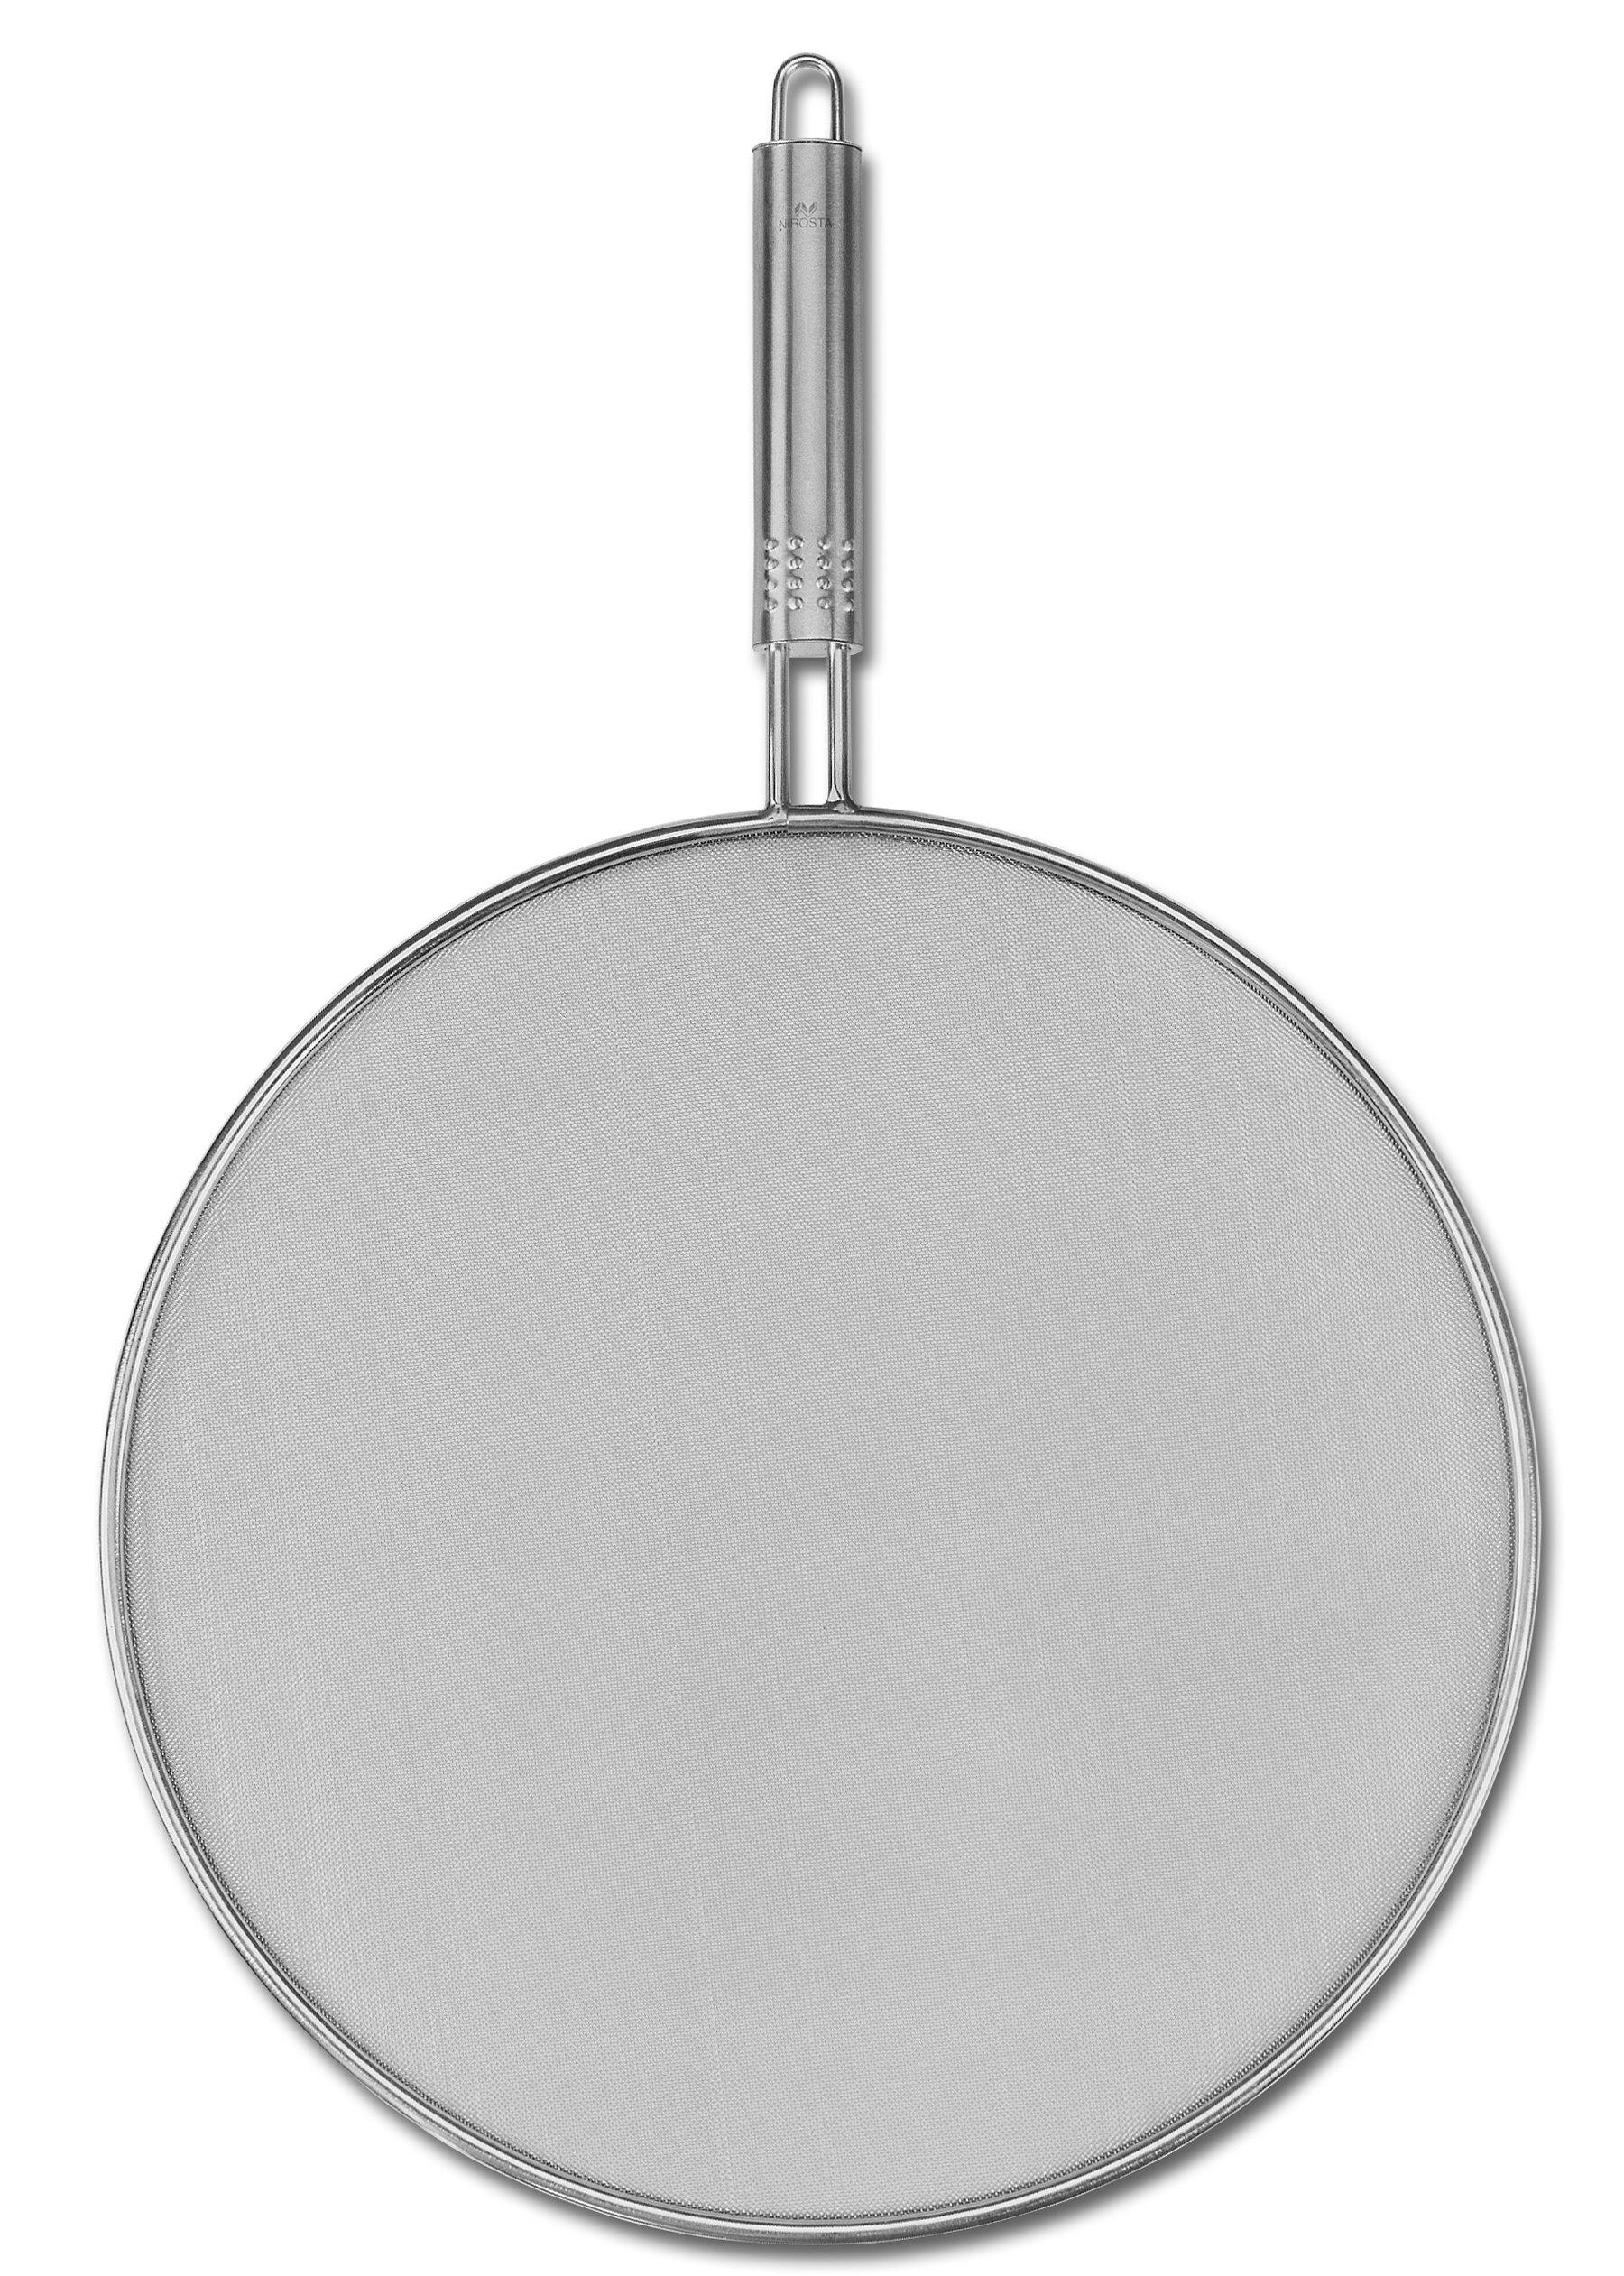 Fackelmann 40478 16.9'' Stainless Steel Splatter Screen, Silver